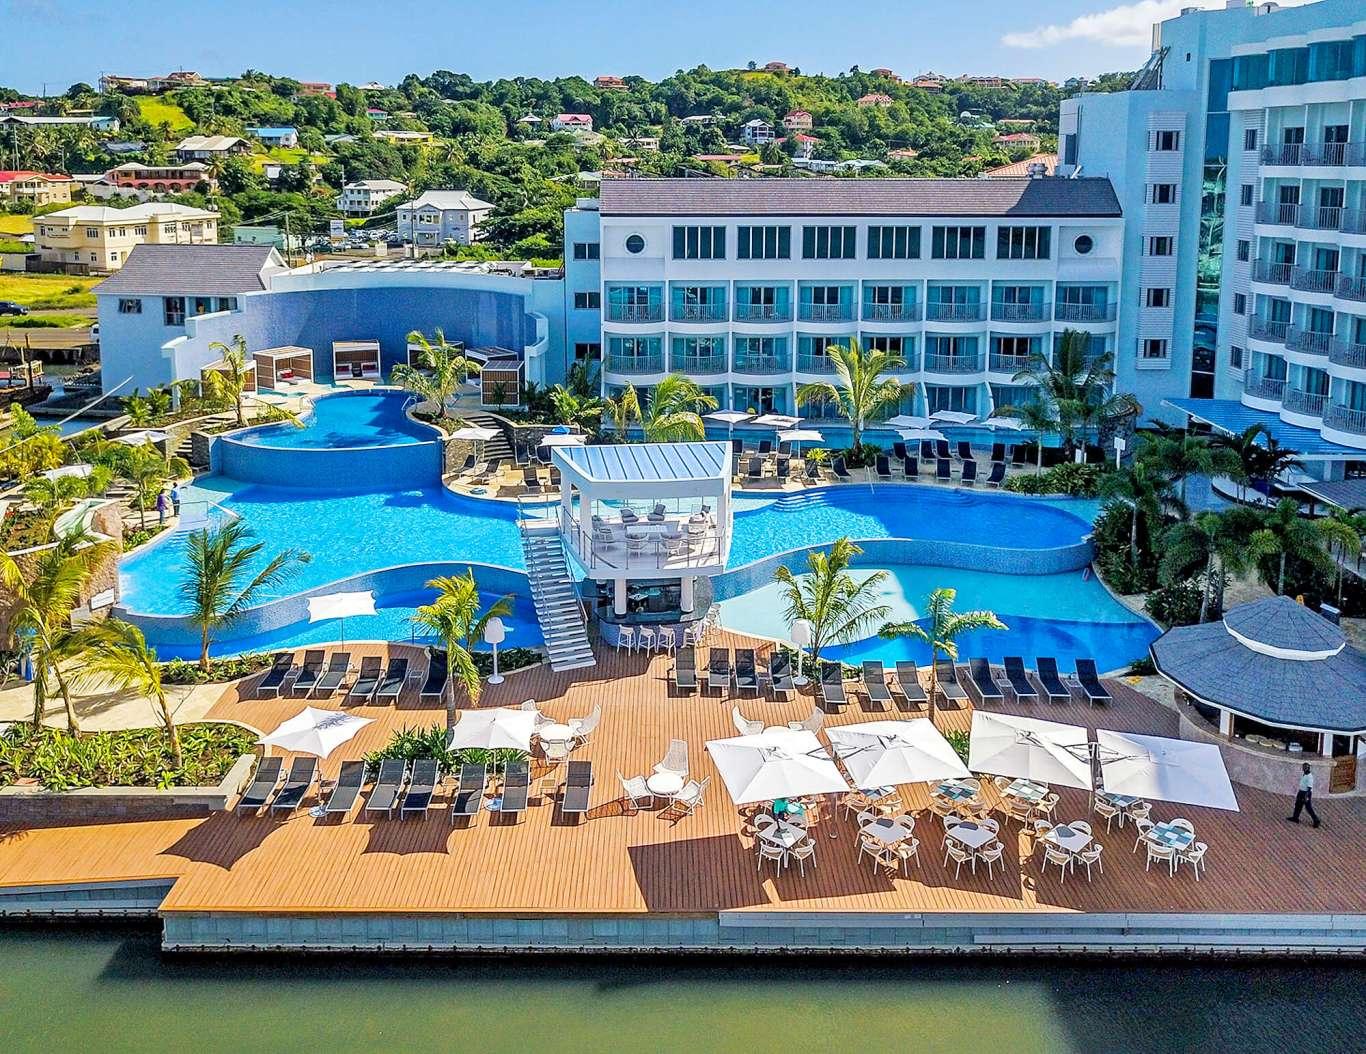 7nt Luxury St. Lucia Escape w/FREE Room Upgrade